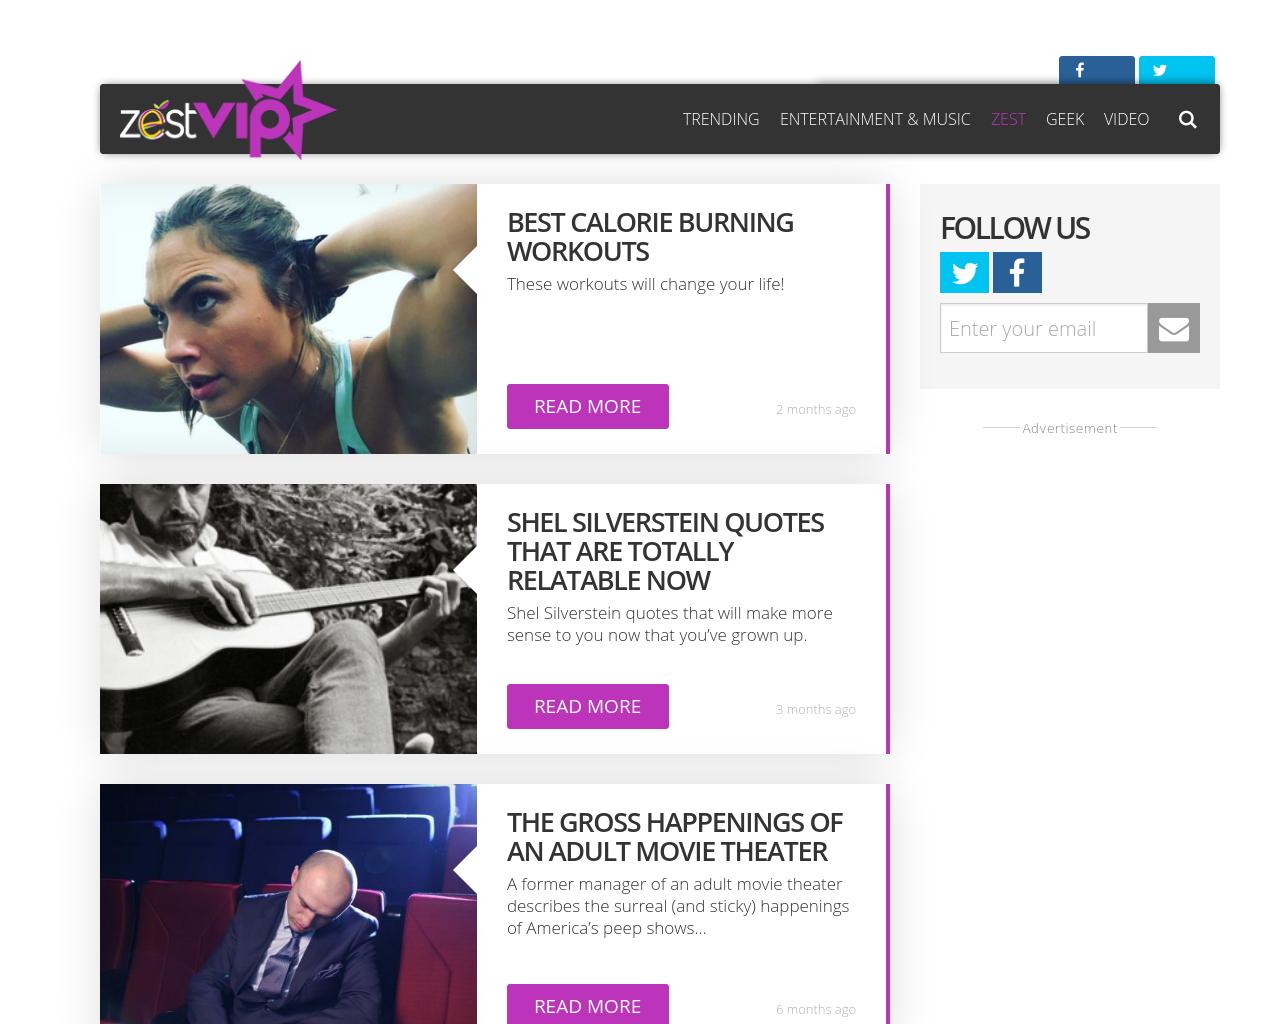 zestvip-Advertising-Reviews-Pricing